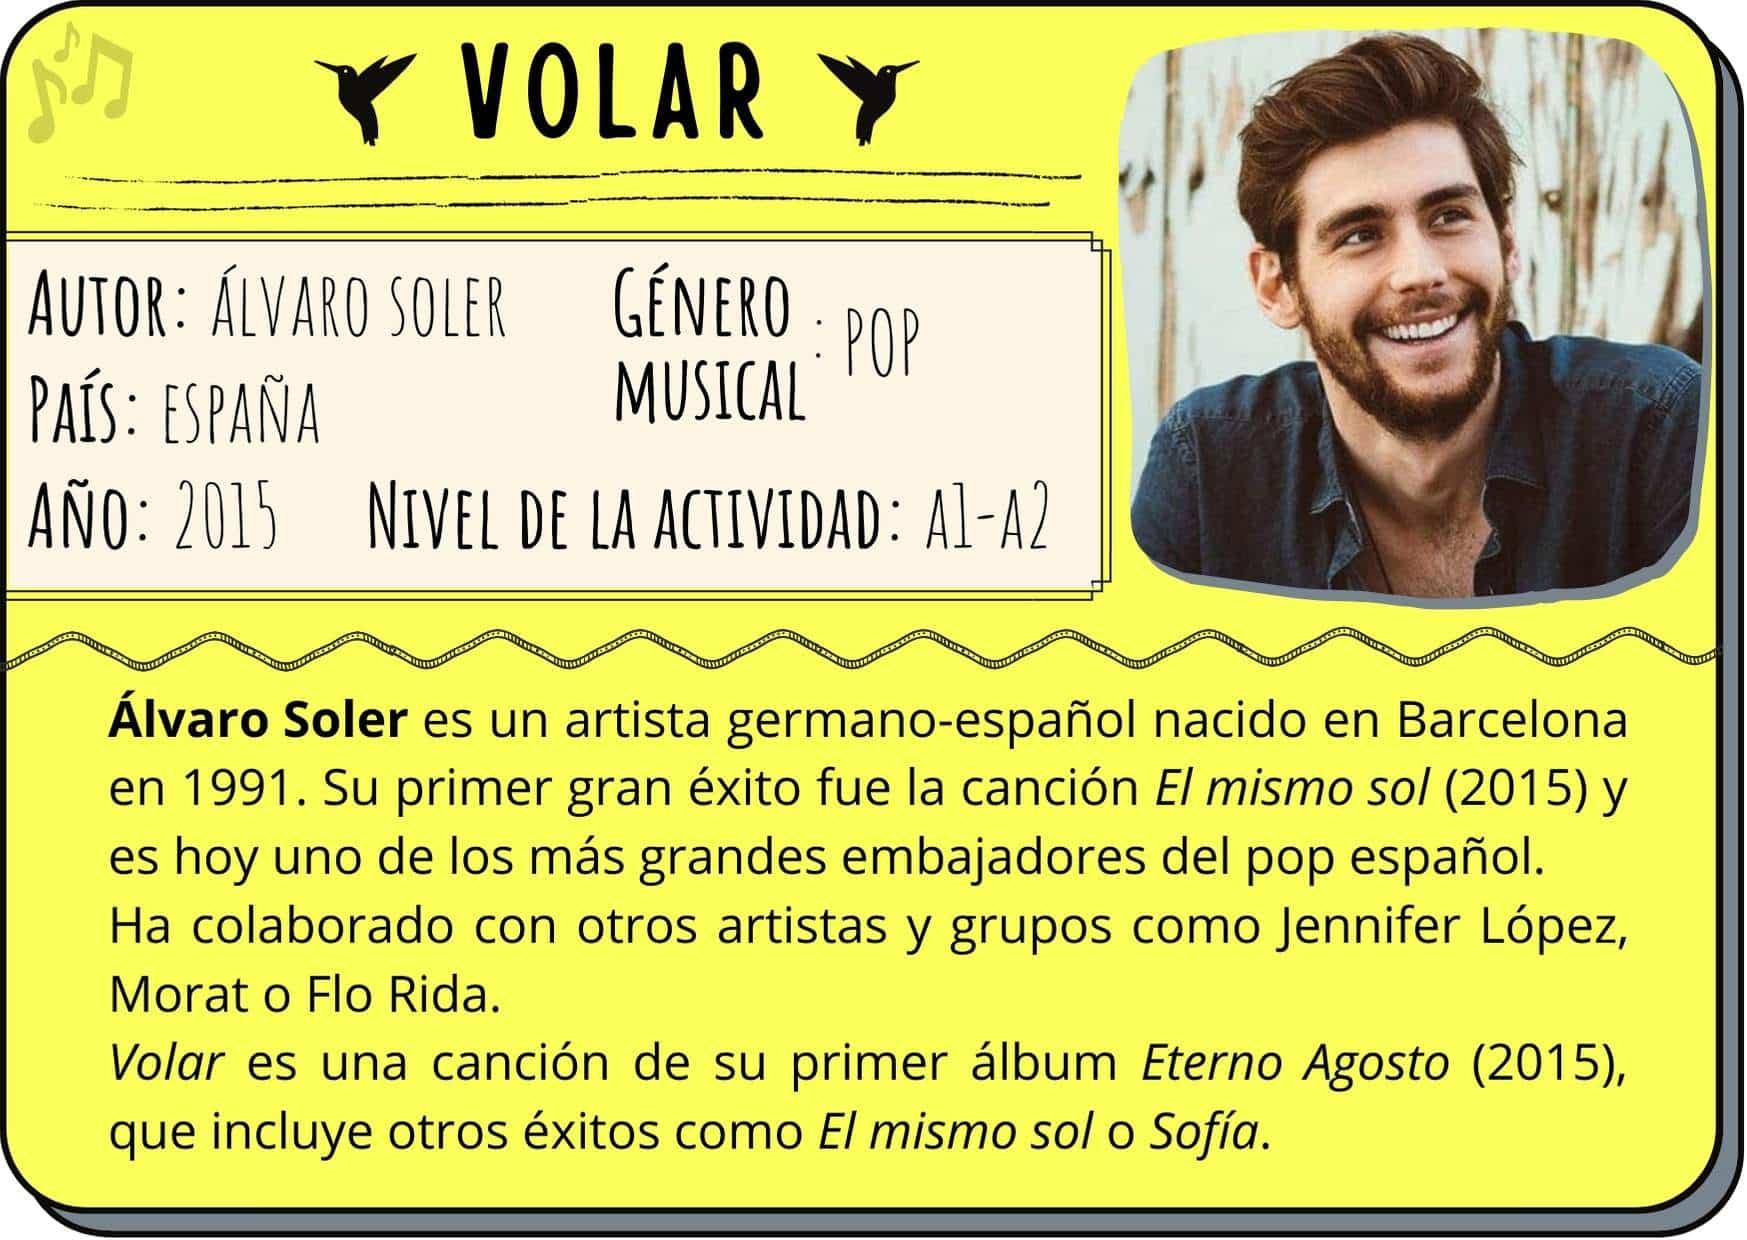 Álvaro Soler ficha